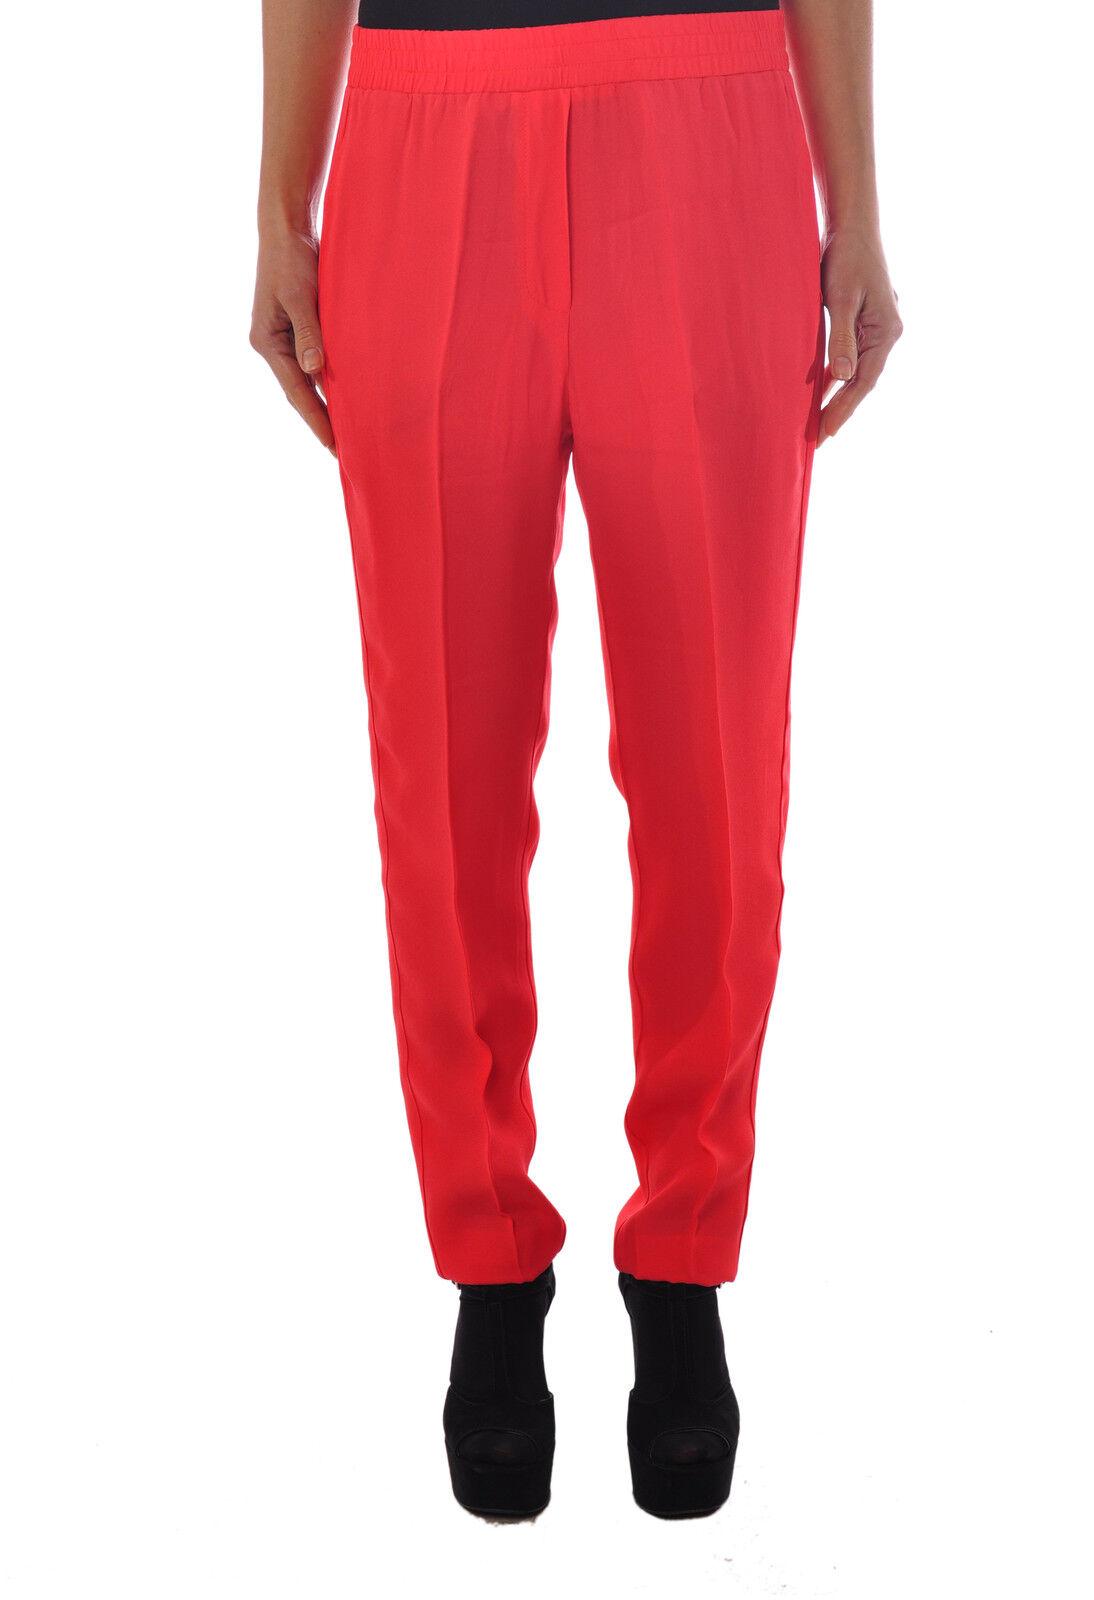 8pm  -  Pants - Female - XS - Orange - 1355604B161224